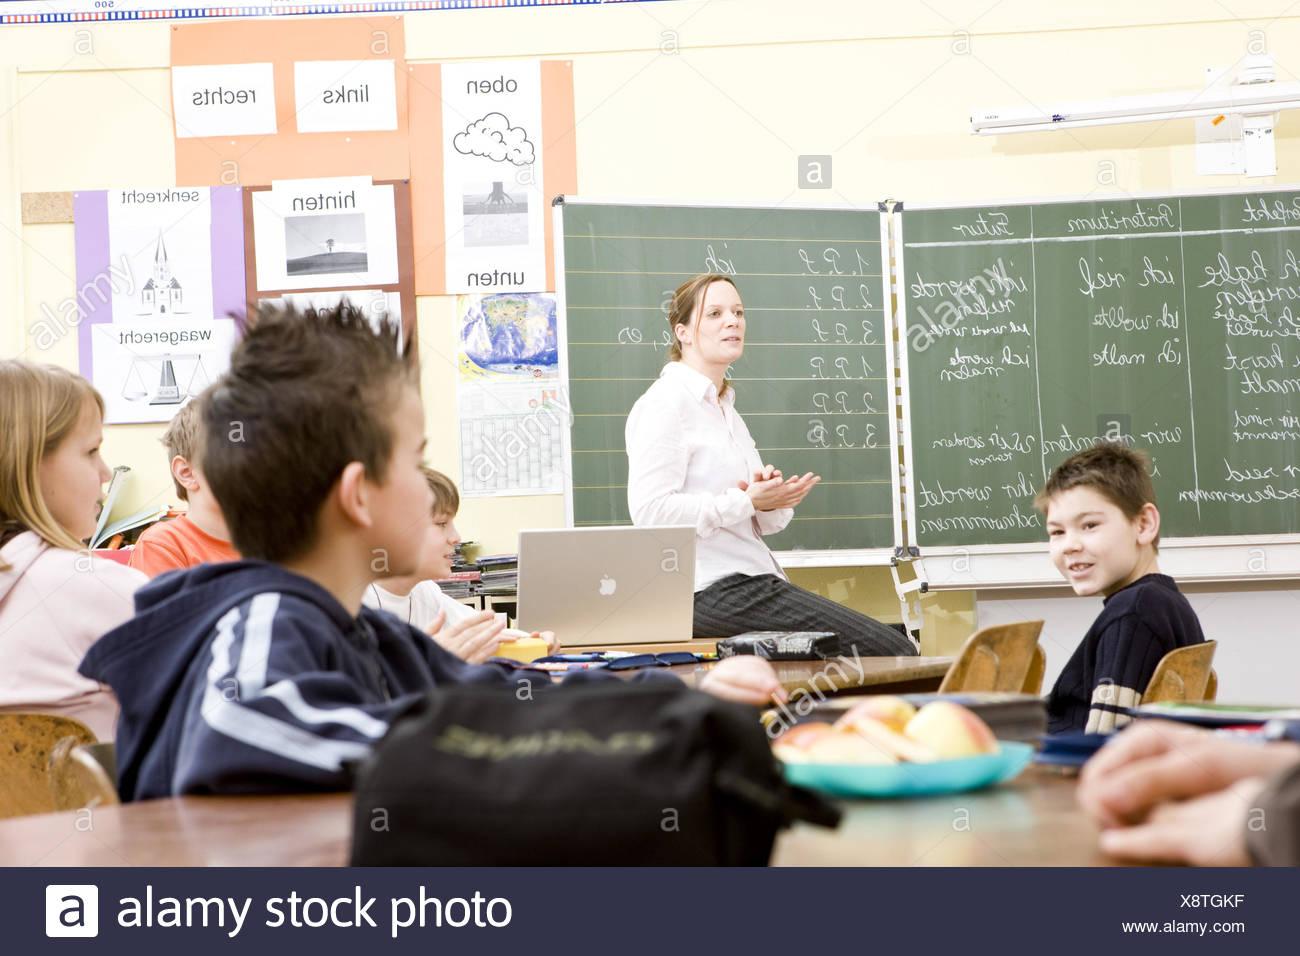 Classroom, teacher, schoolboy, lessons, - Stock Image